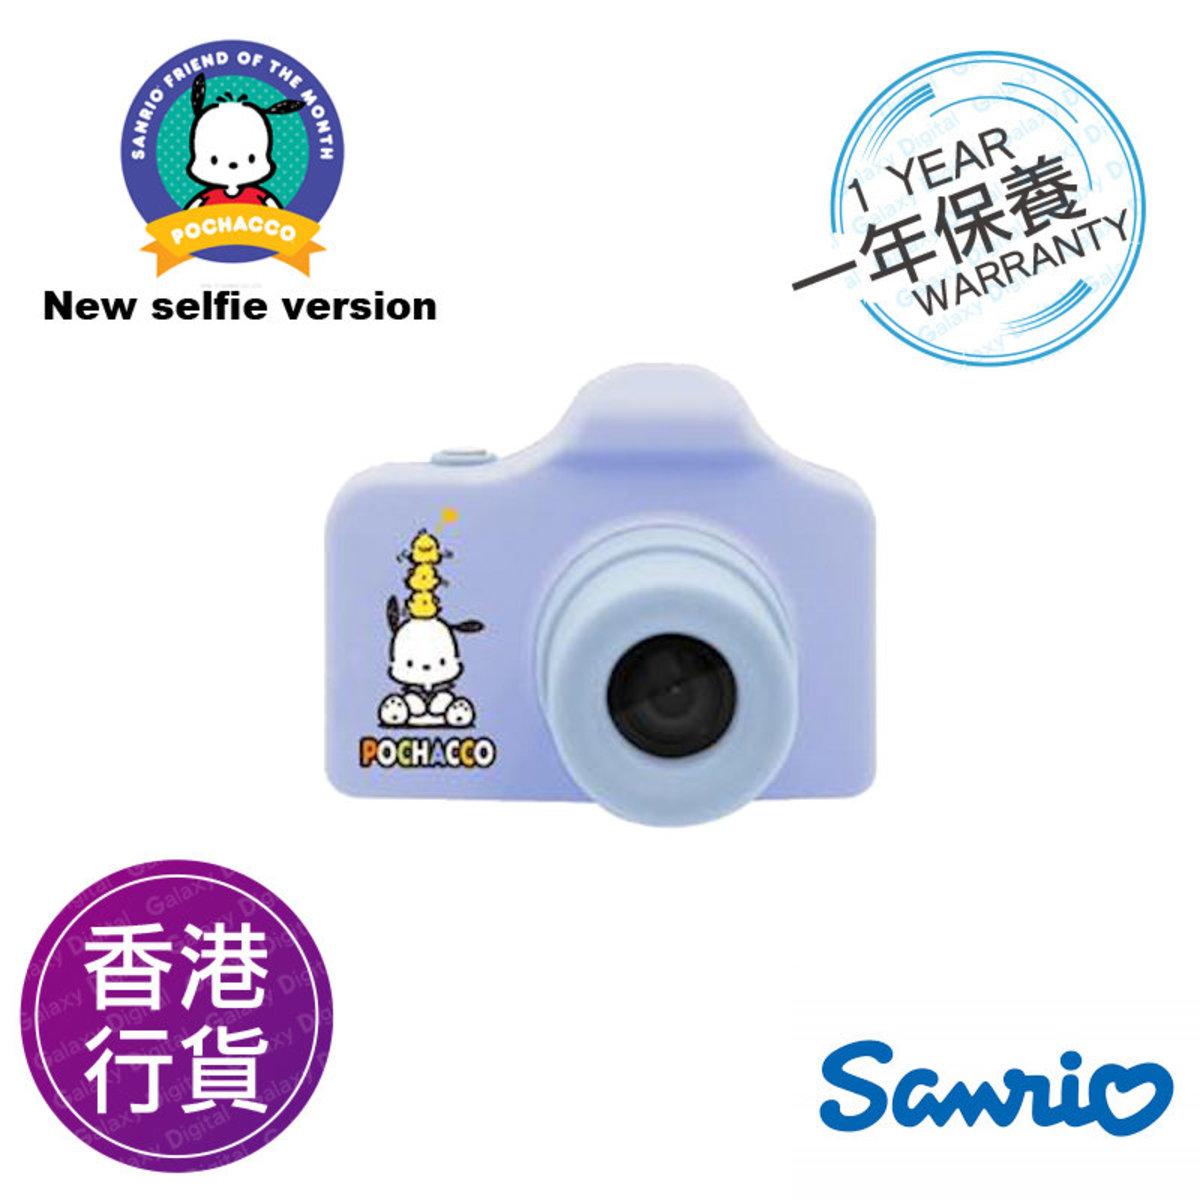 New selfie version Mini Digital Camera Pochacco One Year Warranty